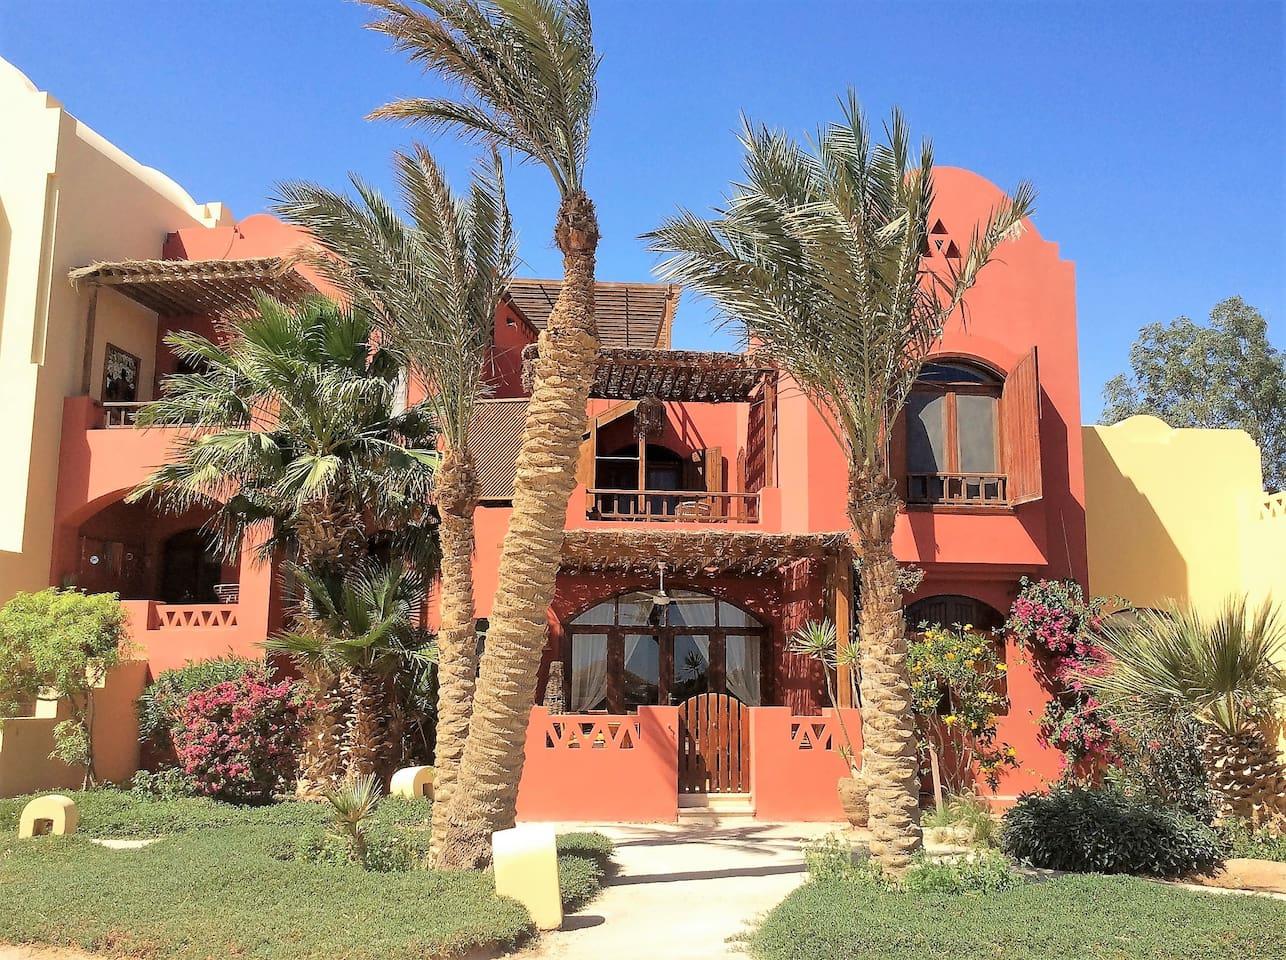 Villa Melody